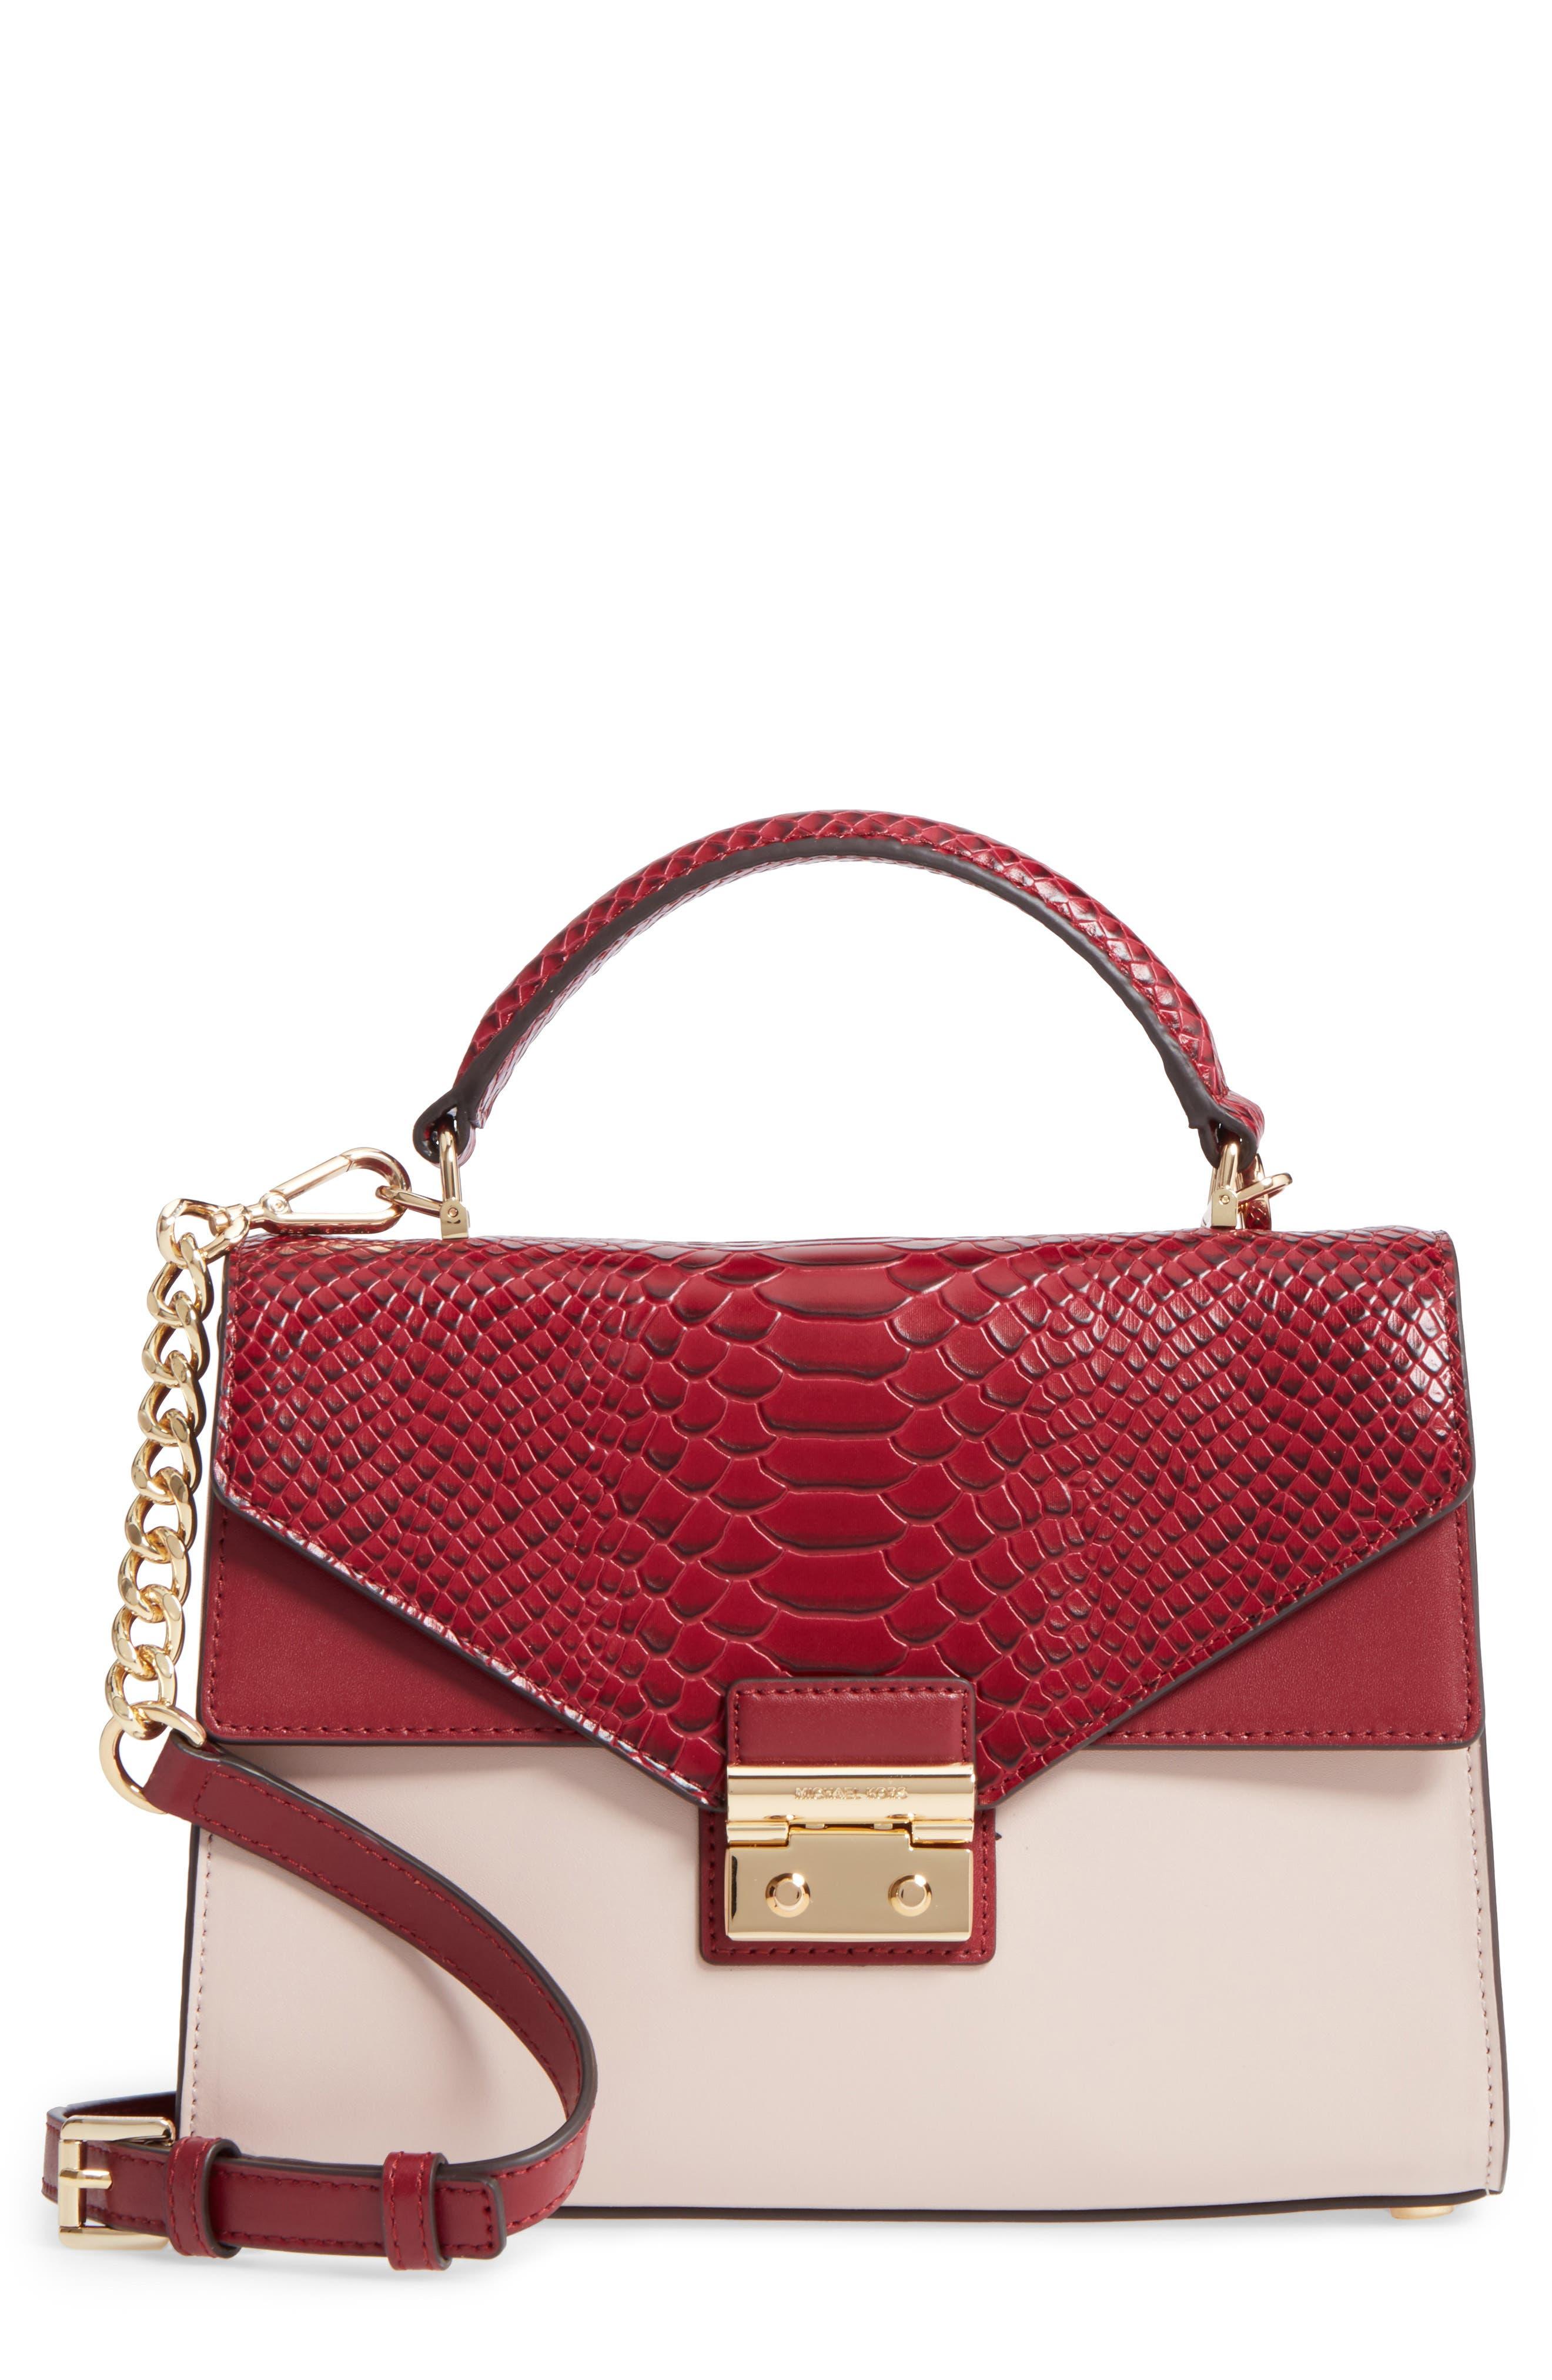 MICHAEL MICHAEL KORS Medium Sloan Leather Shoulder Bag